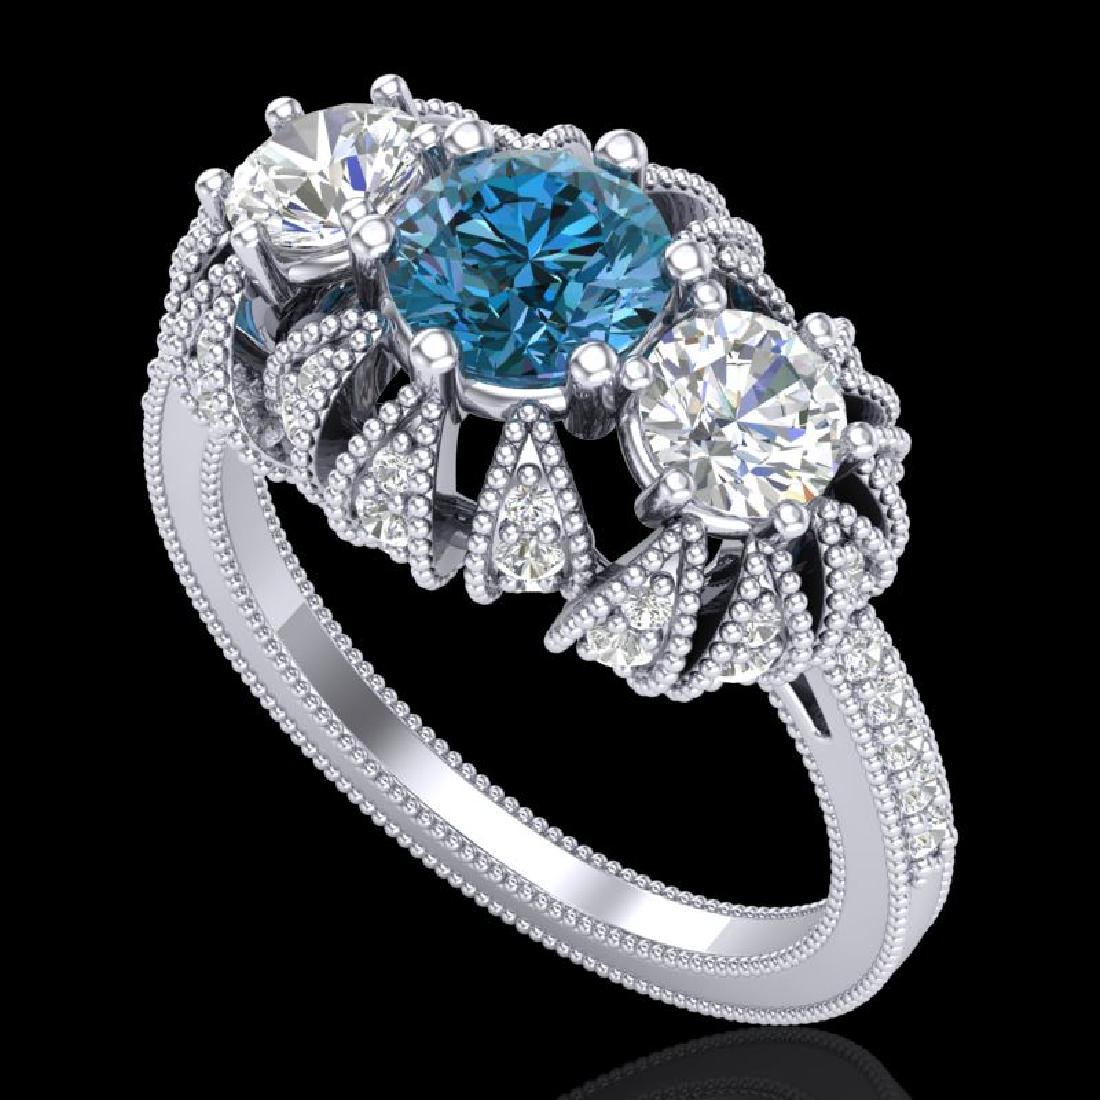 2.26 CTW Intense Blue Diamond Art Deco Micro Pave 3